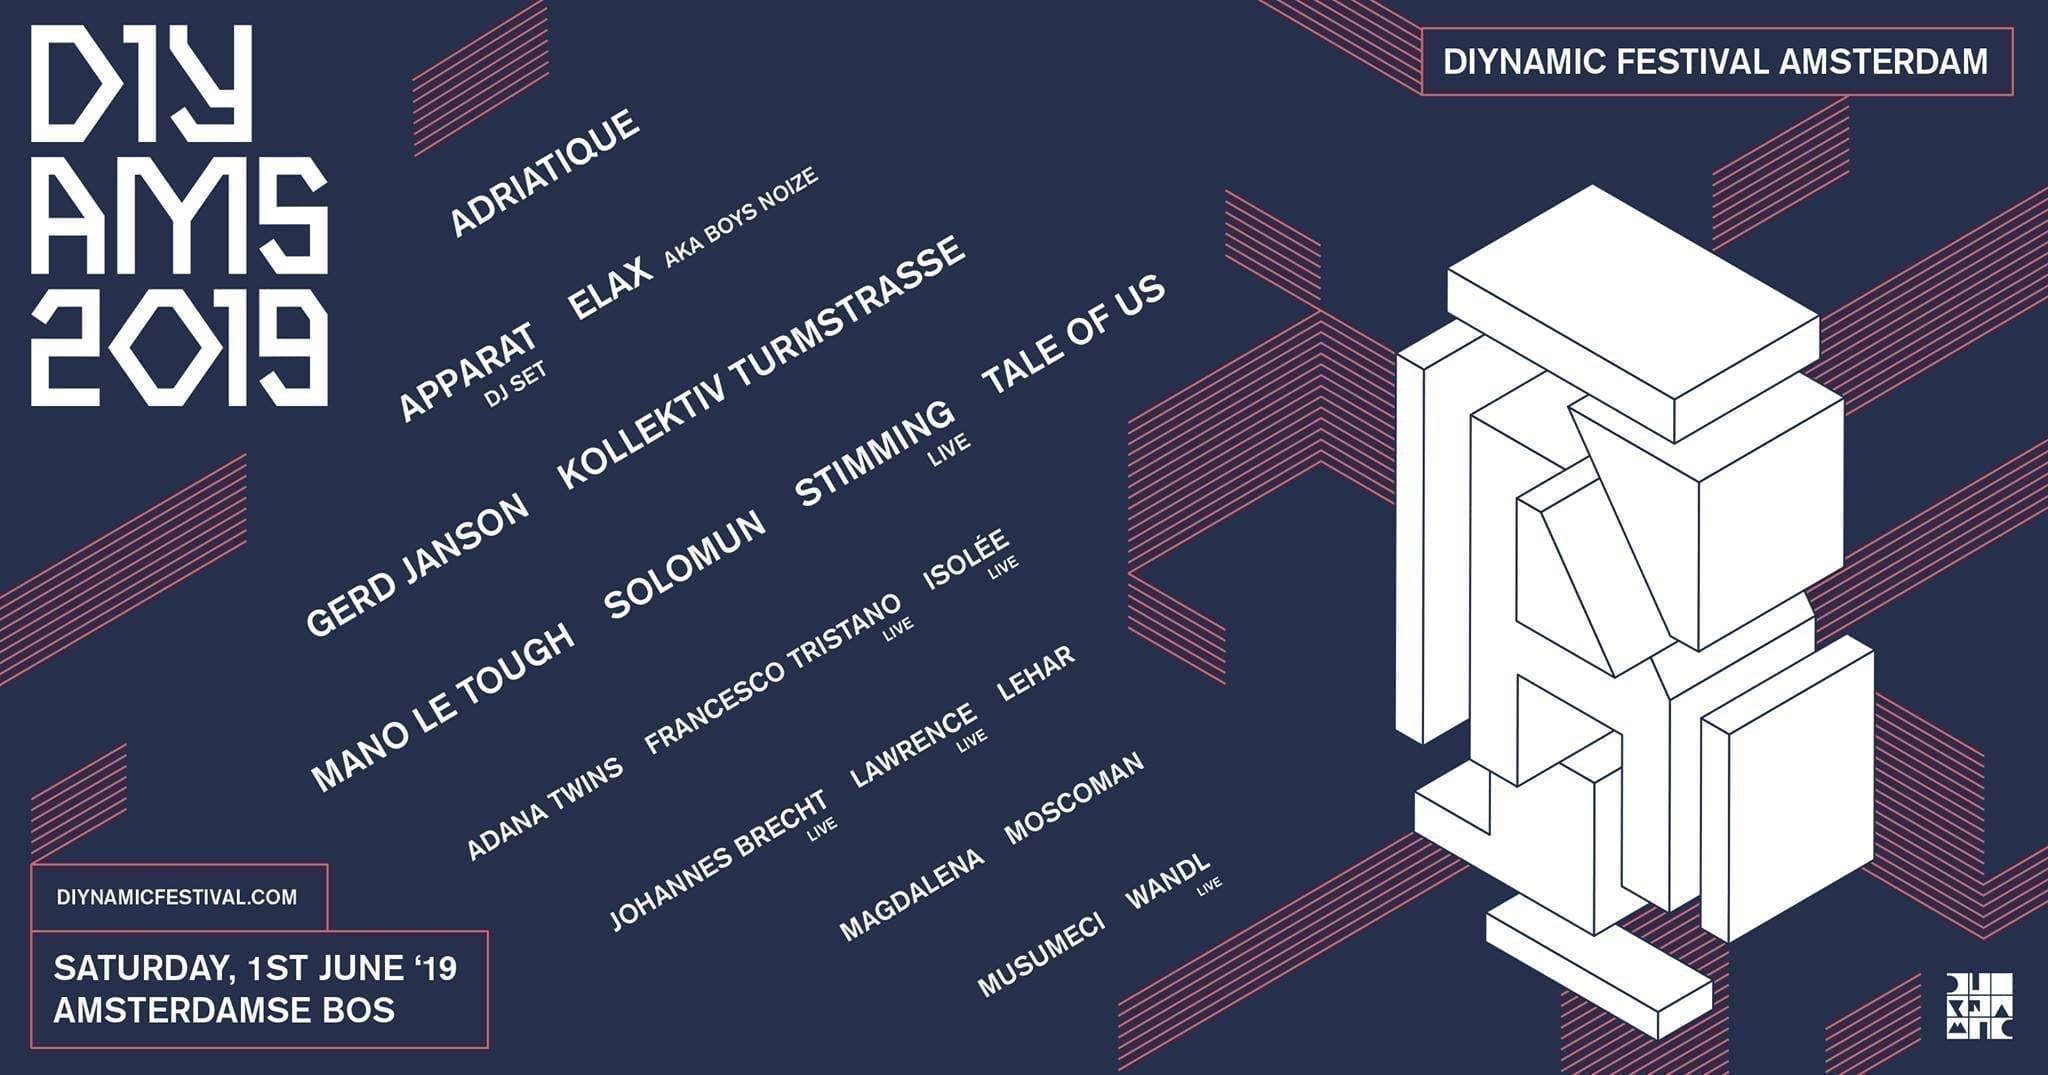 Diynamic Festival Amsterdam 2019